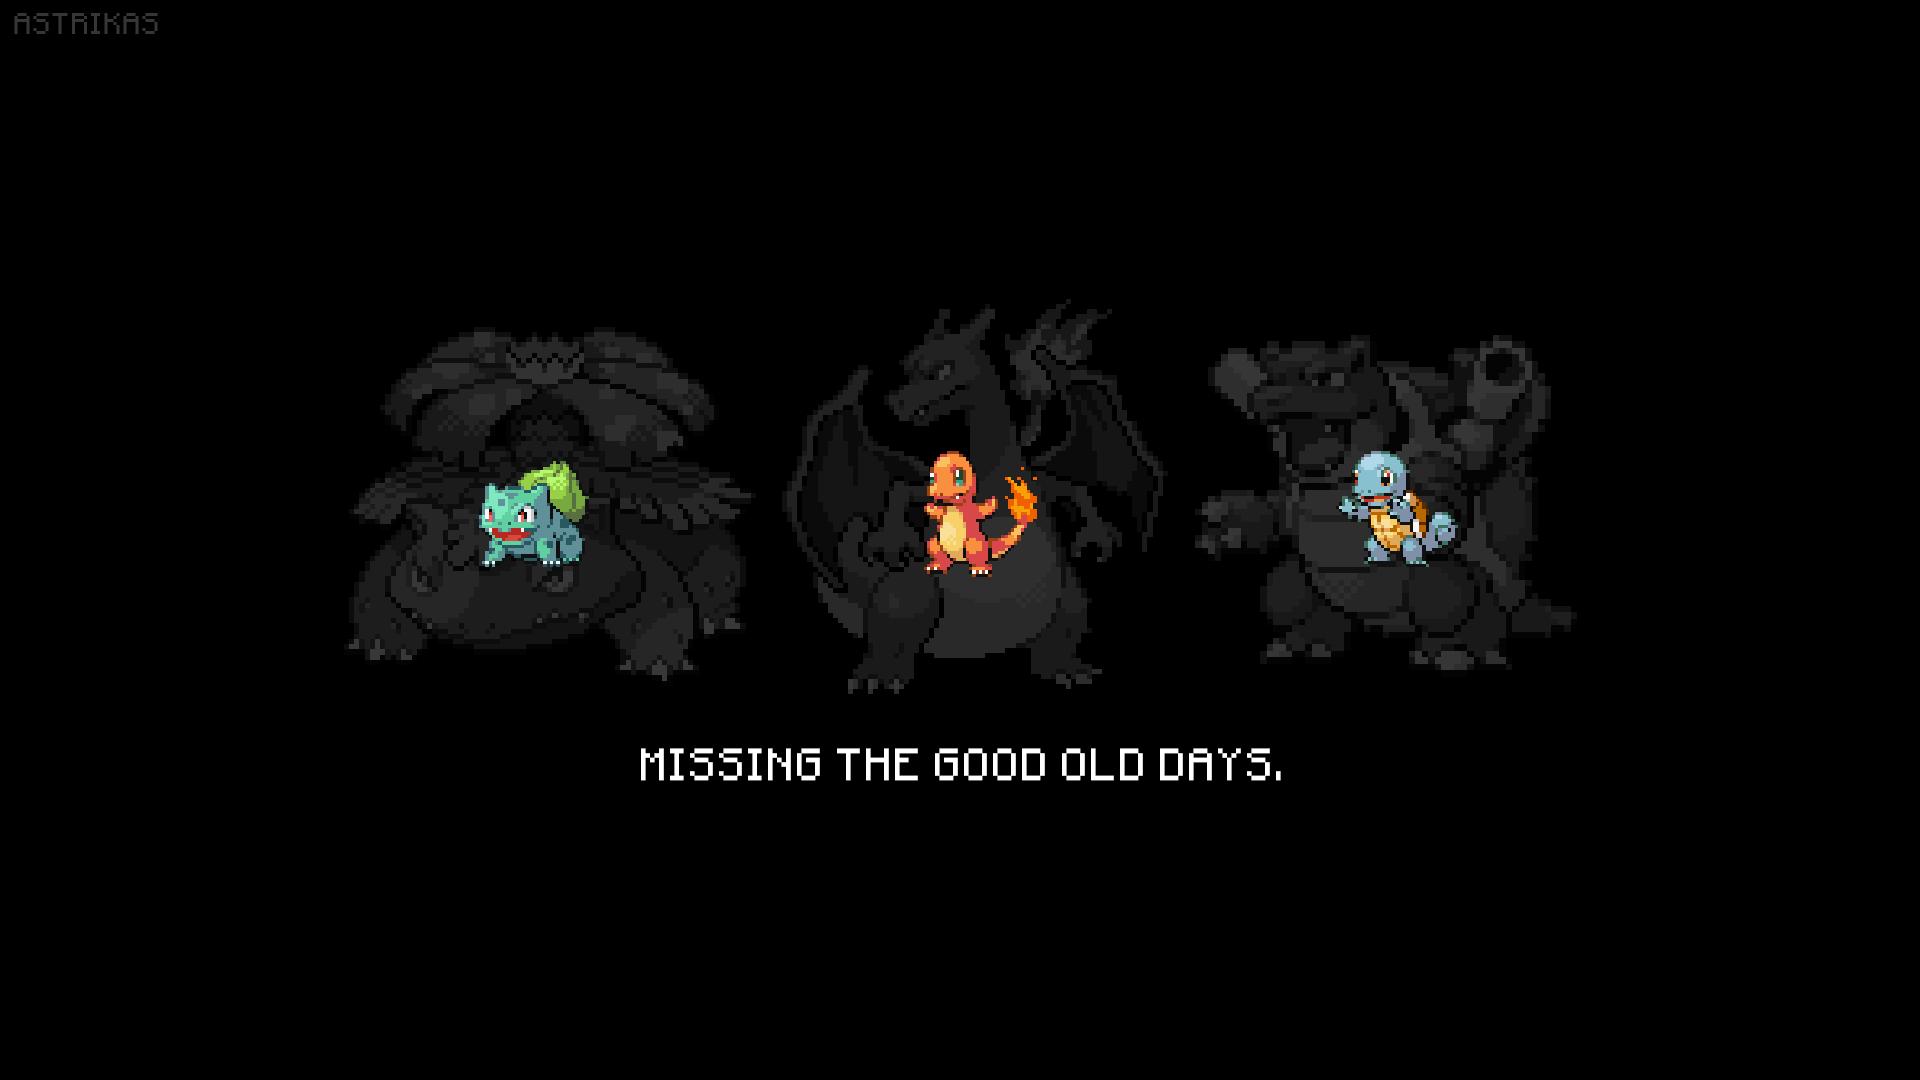 General 1920x1080 Pokémon Charmander Charizard Blastoise fan art Bulbasaur Venusaur Squirtle pixel art retro games pokemon third generation pixelated digital art video games black background Pokemon First Generation